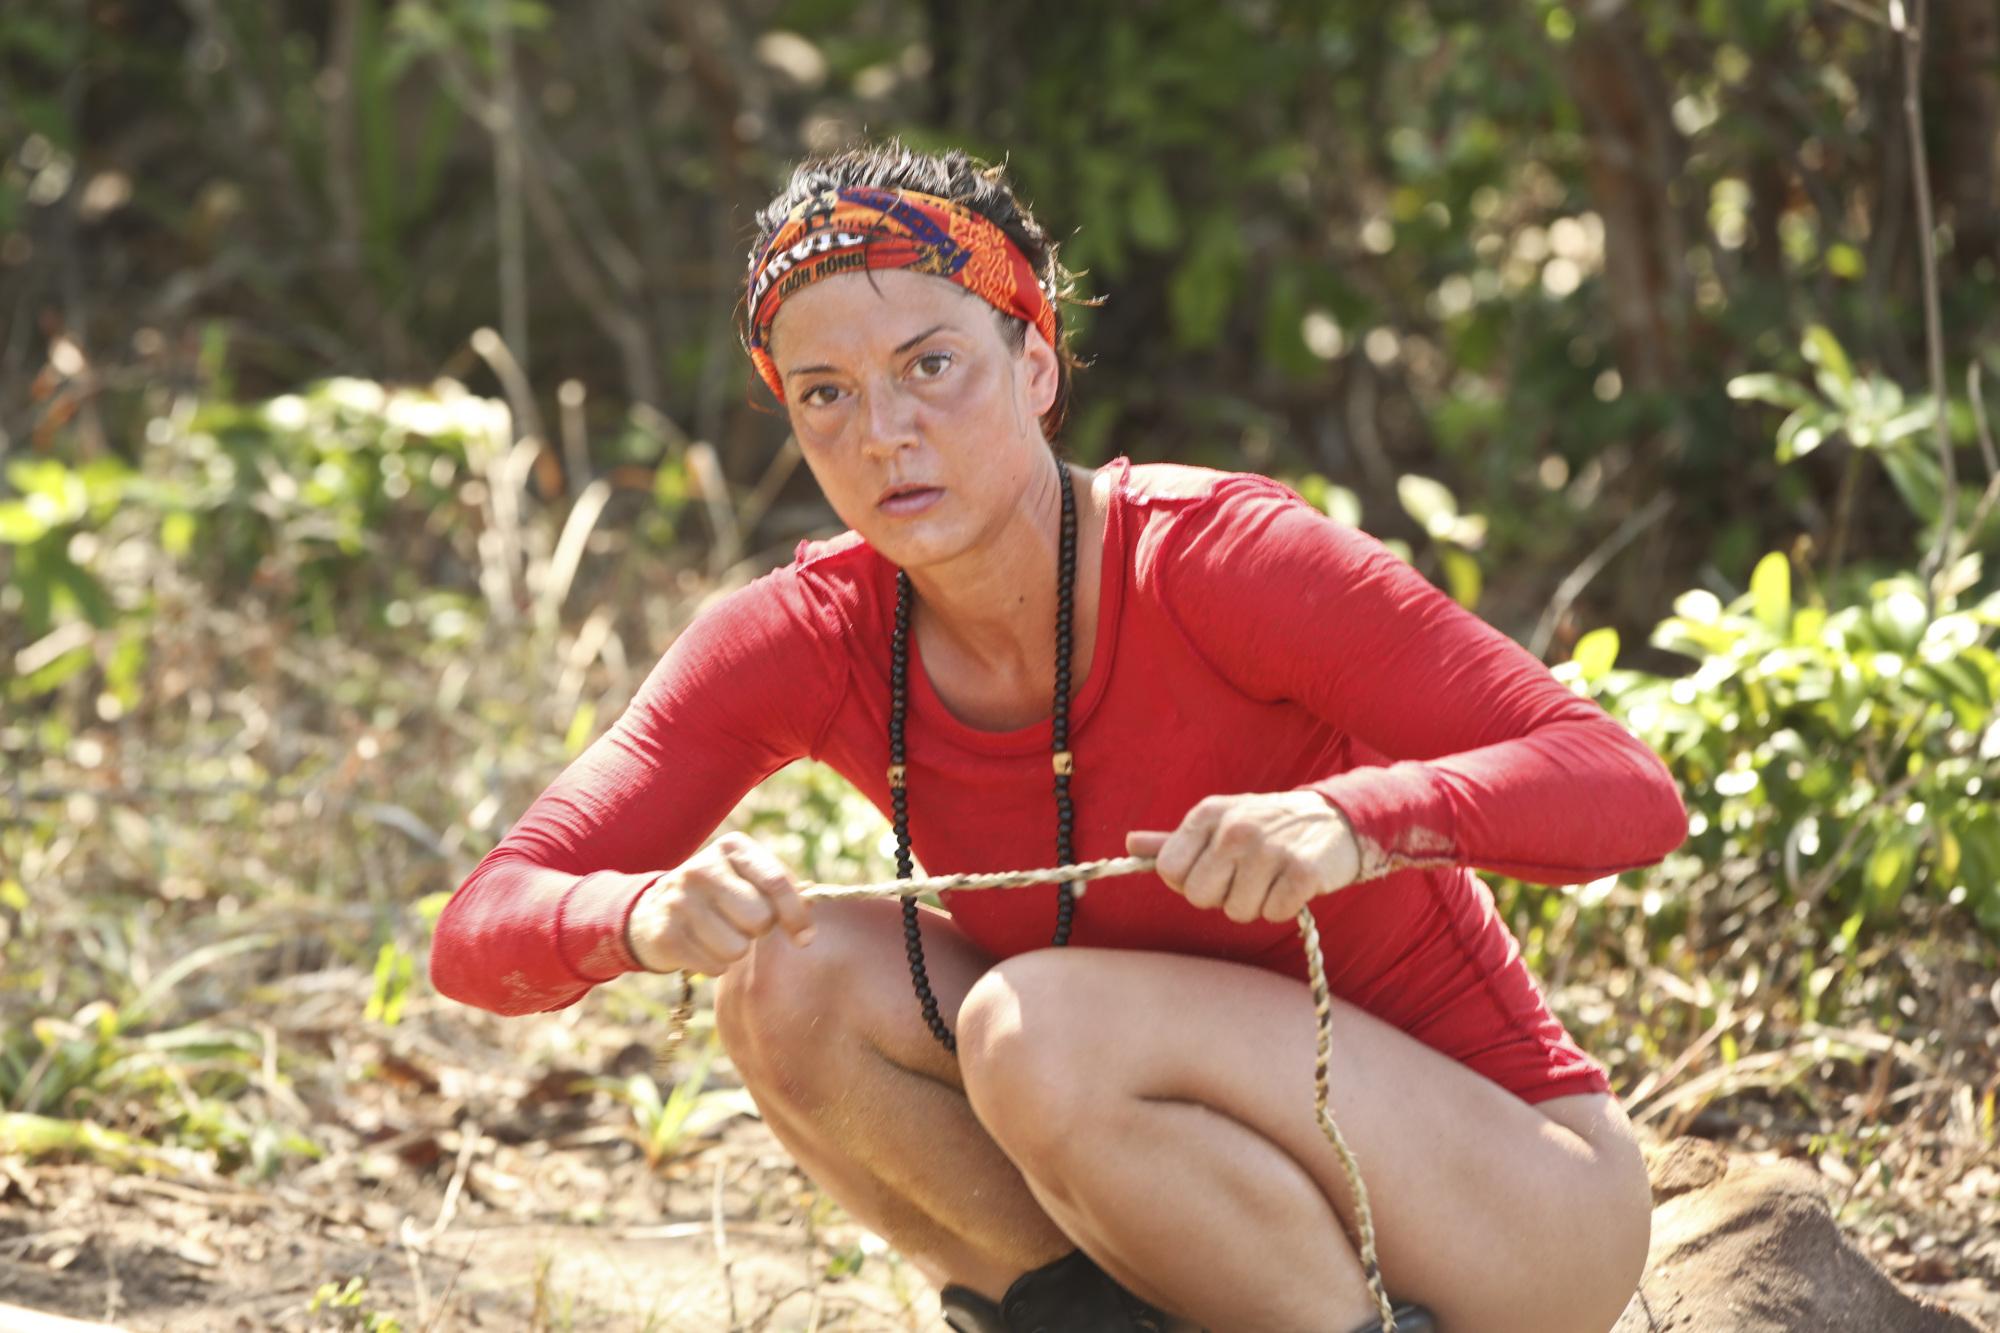 Jennifer Lanzetti at the Brawn tribe camp on Survivor: Kaoh Rong